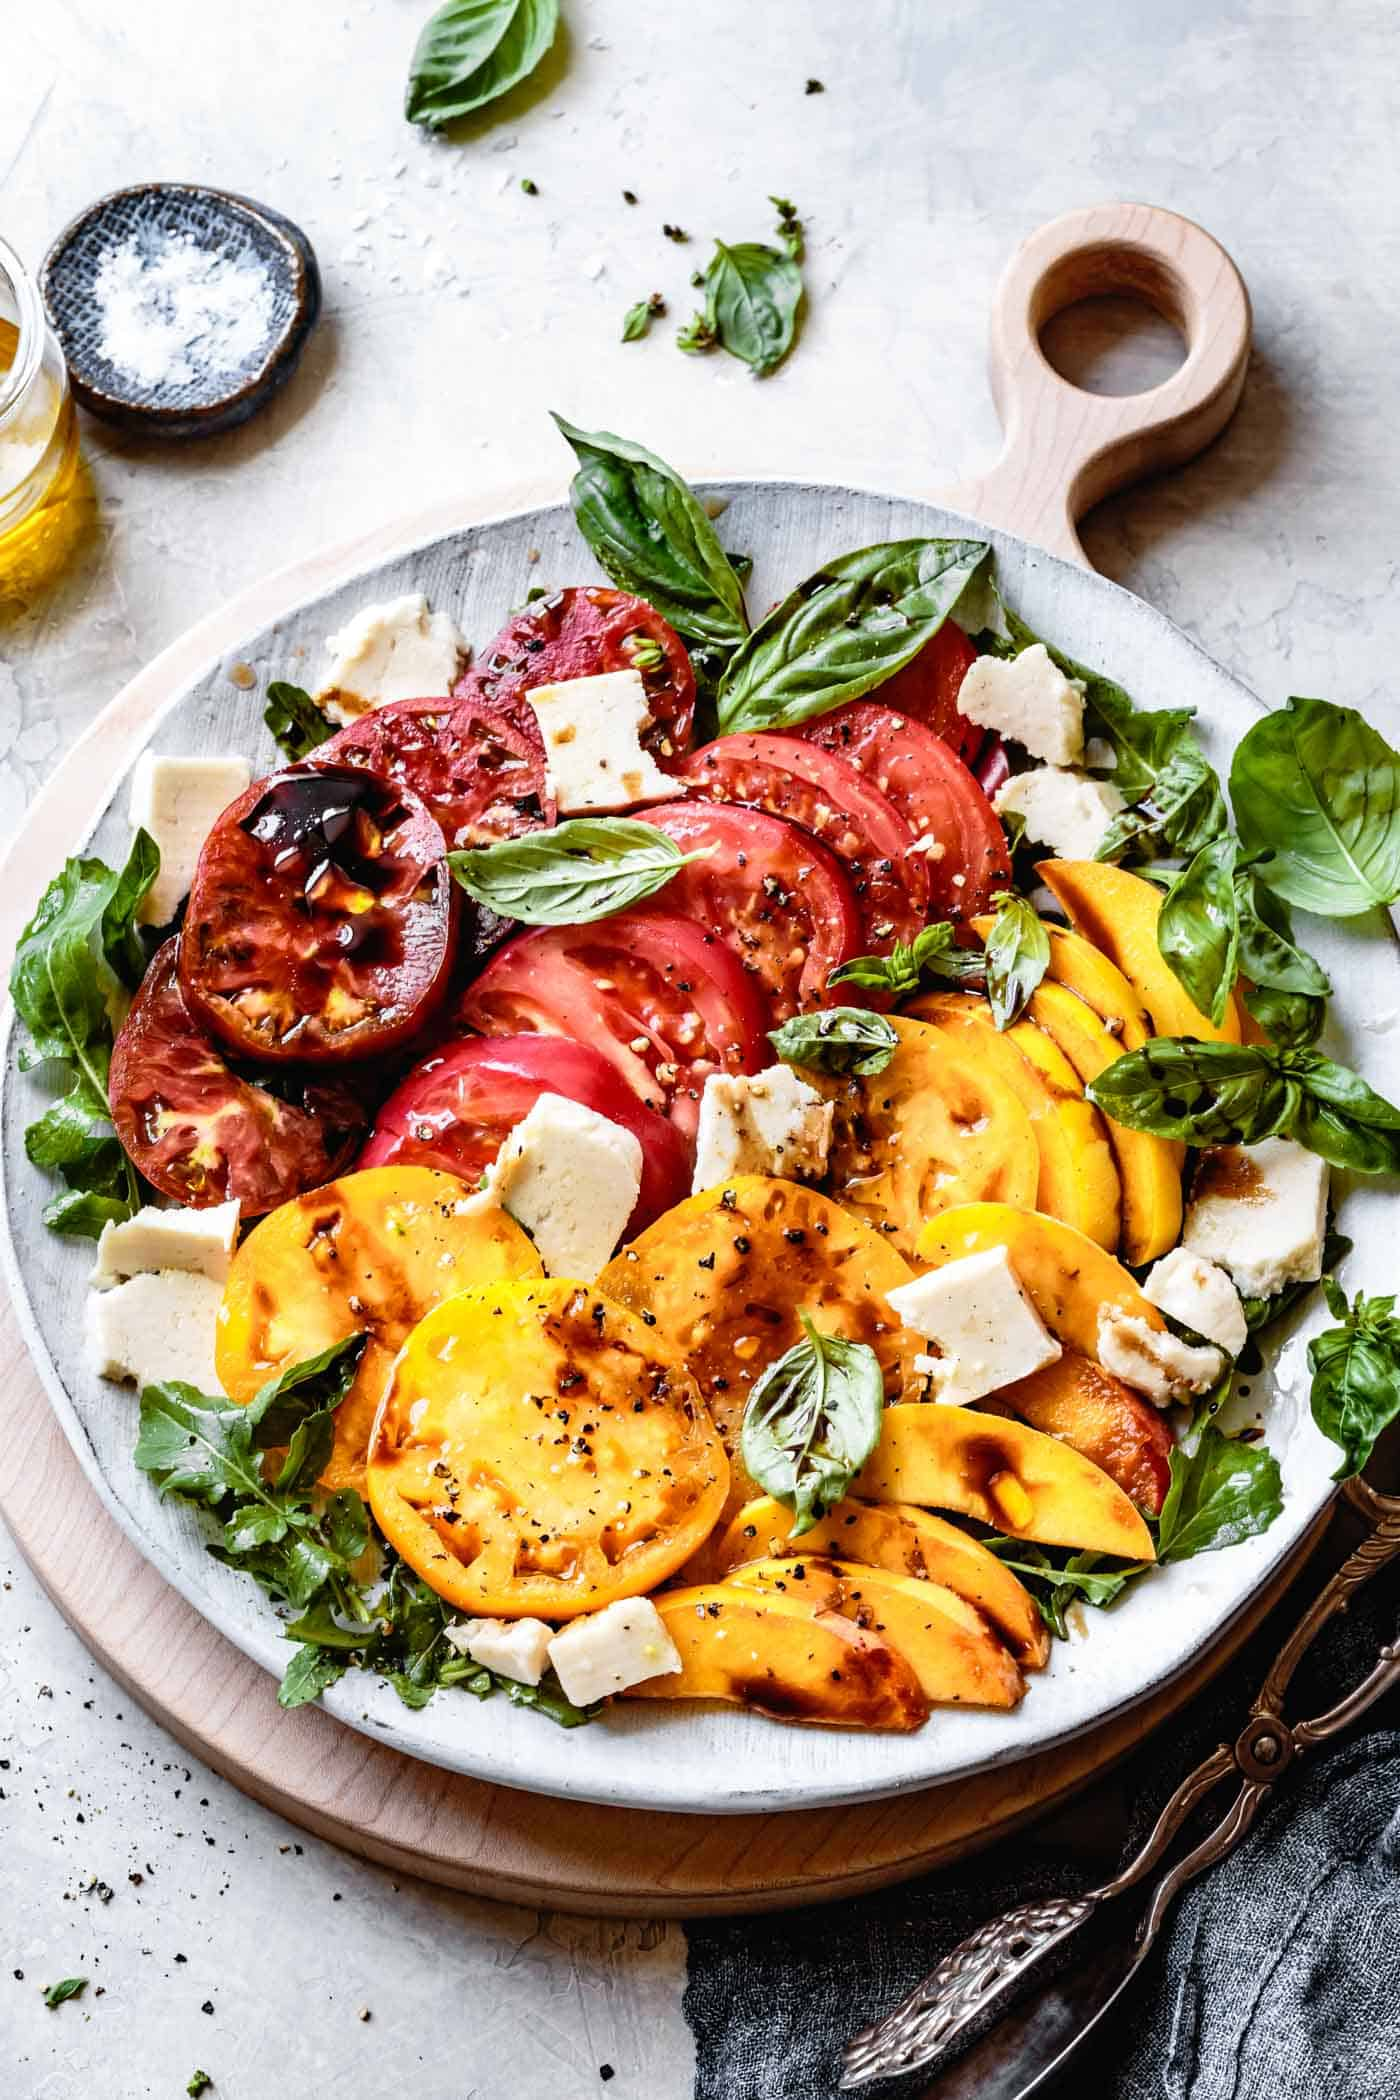 Vegan arugula peach caprese salad recipe on a platter